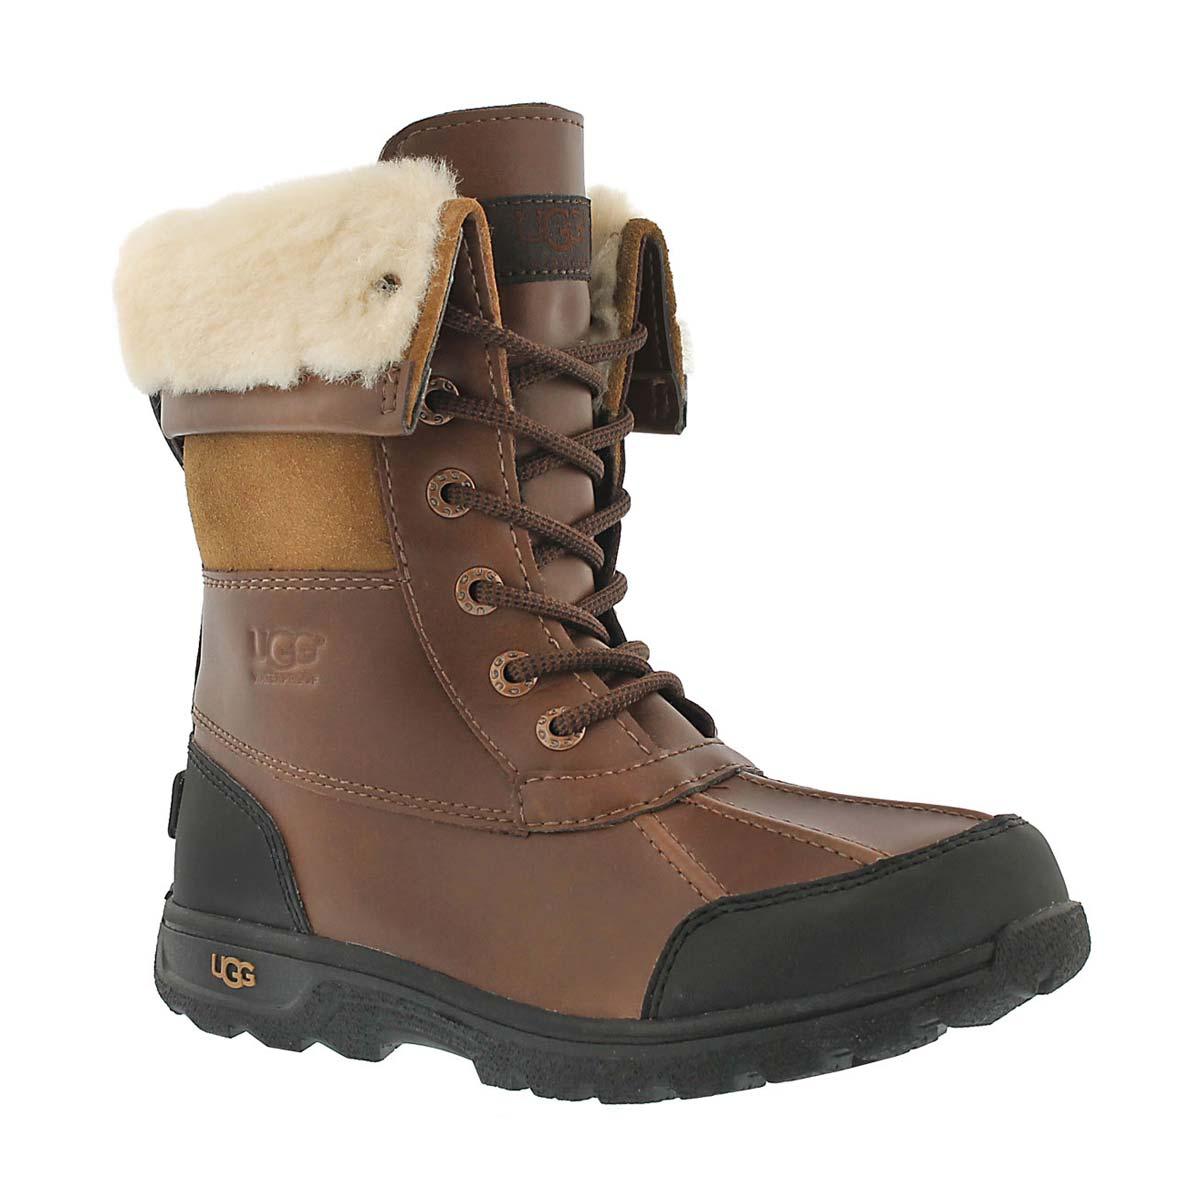 Kids' BUTTE II worchester waterproof winter boots